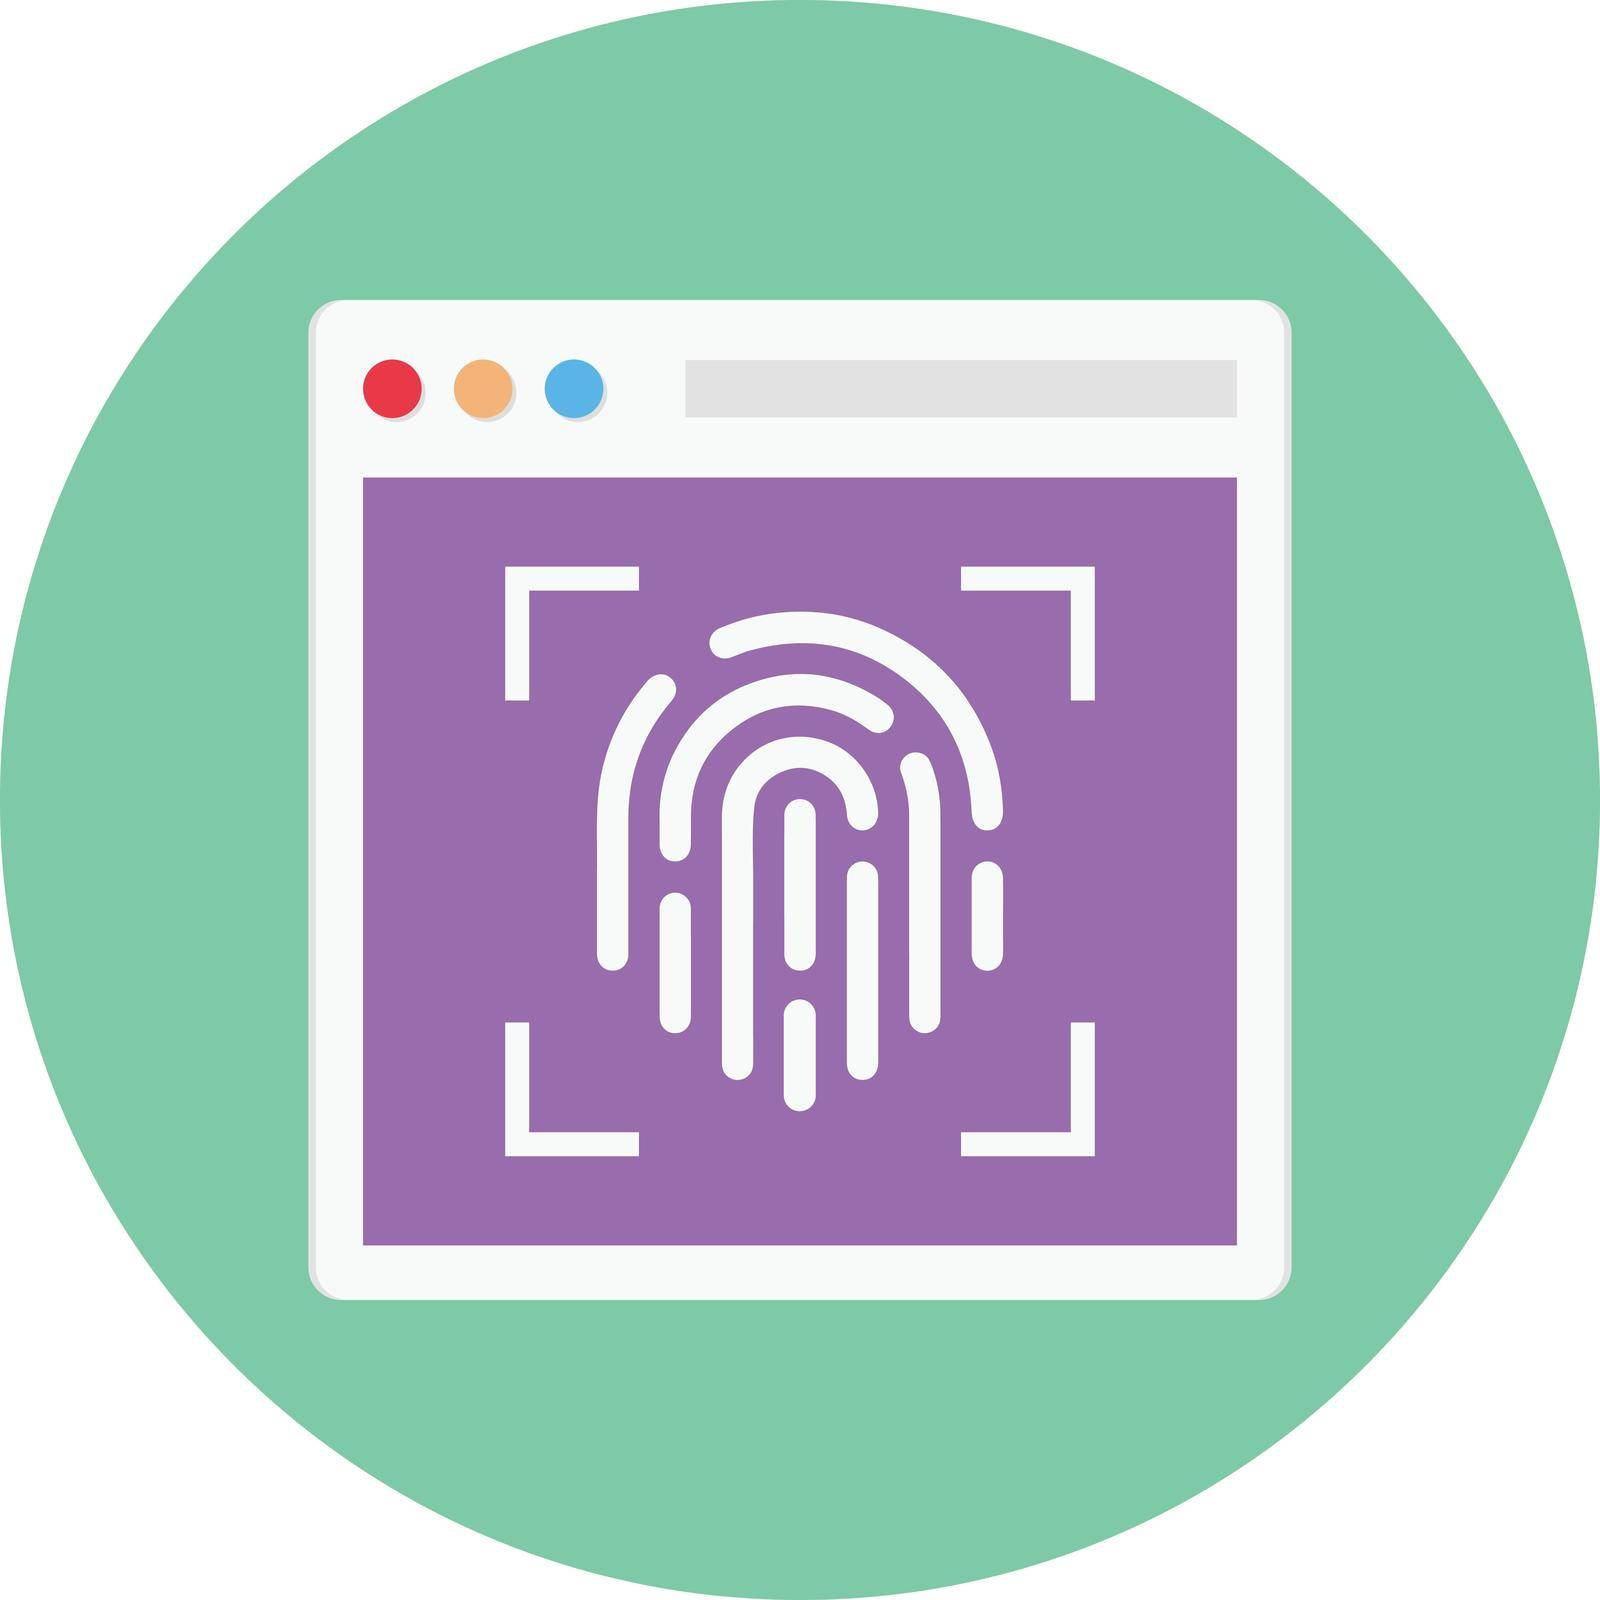 fingerprint vector circle flat icon